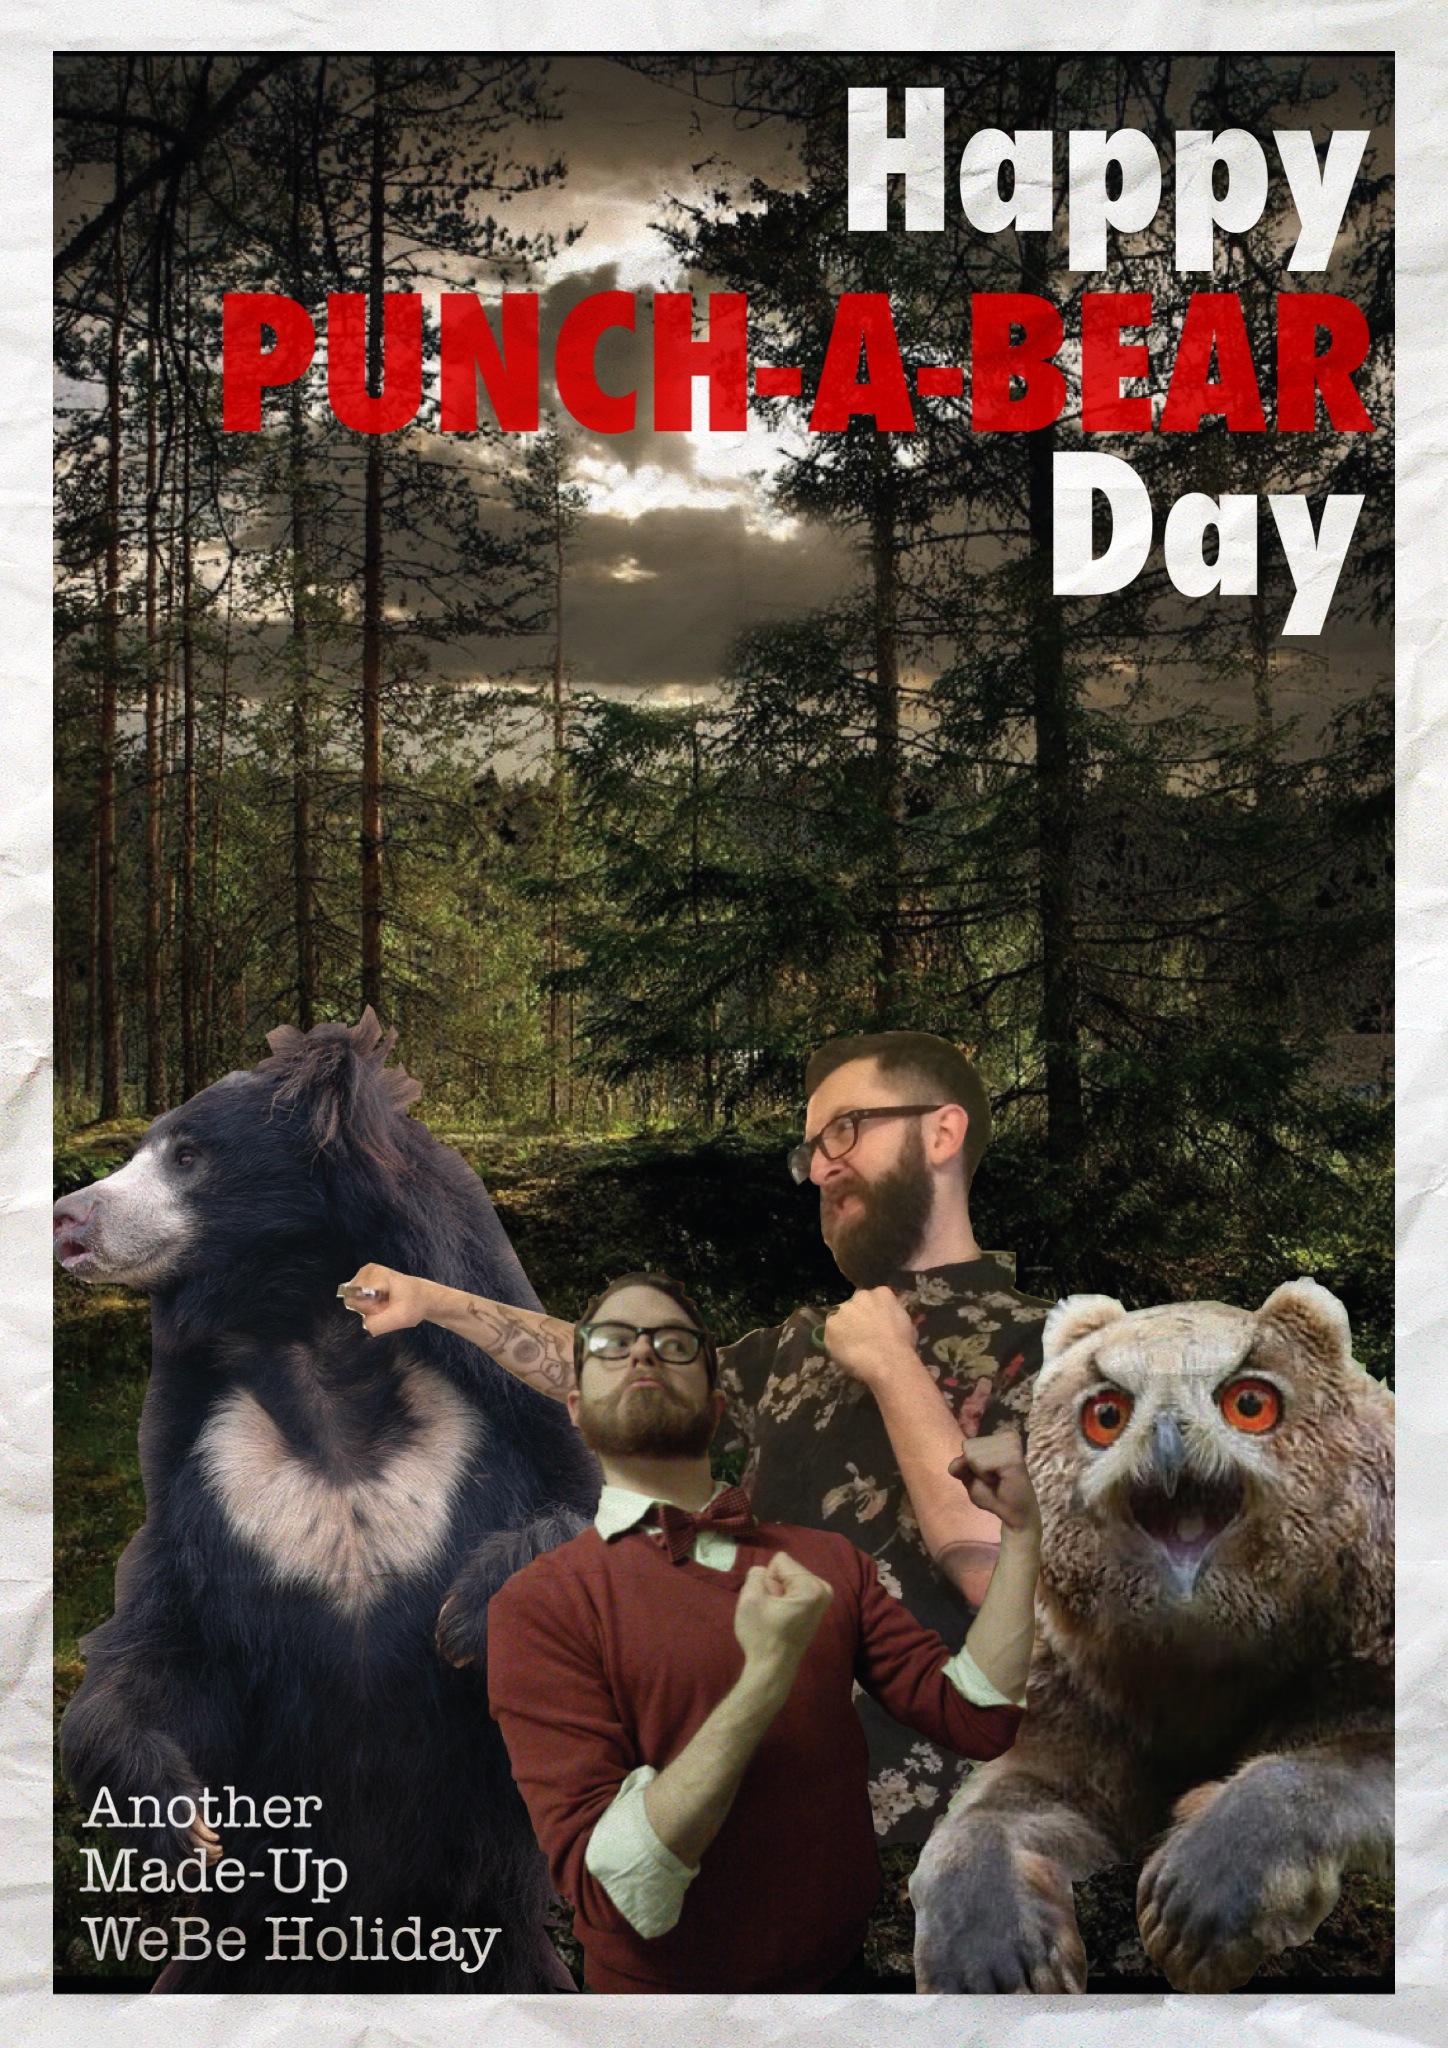 Punch-a-Bear Day 2013 - WeBe 01.jpg